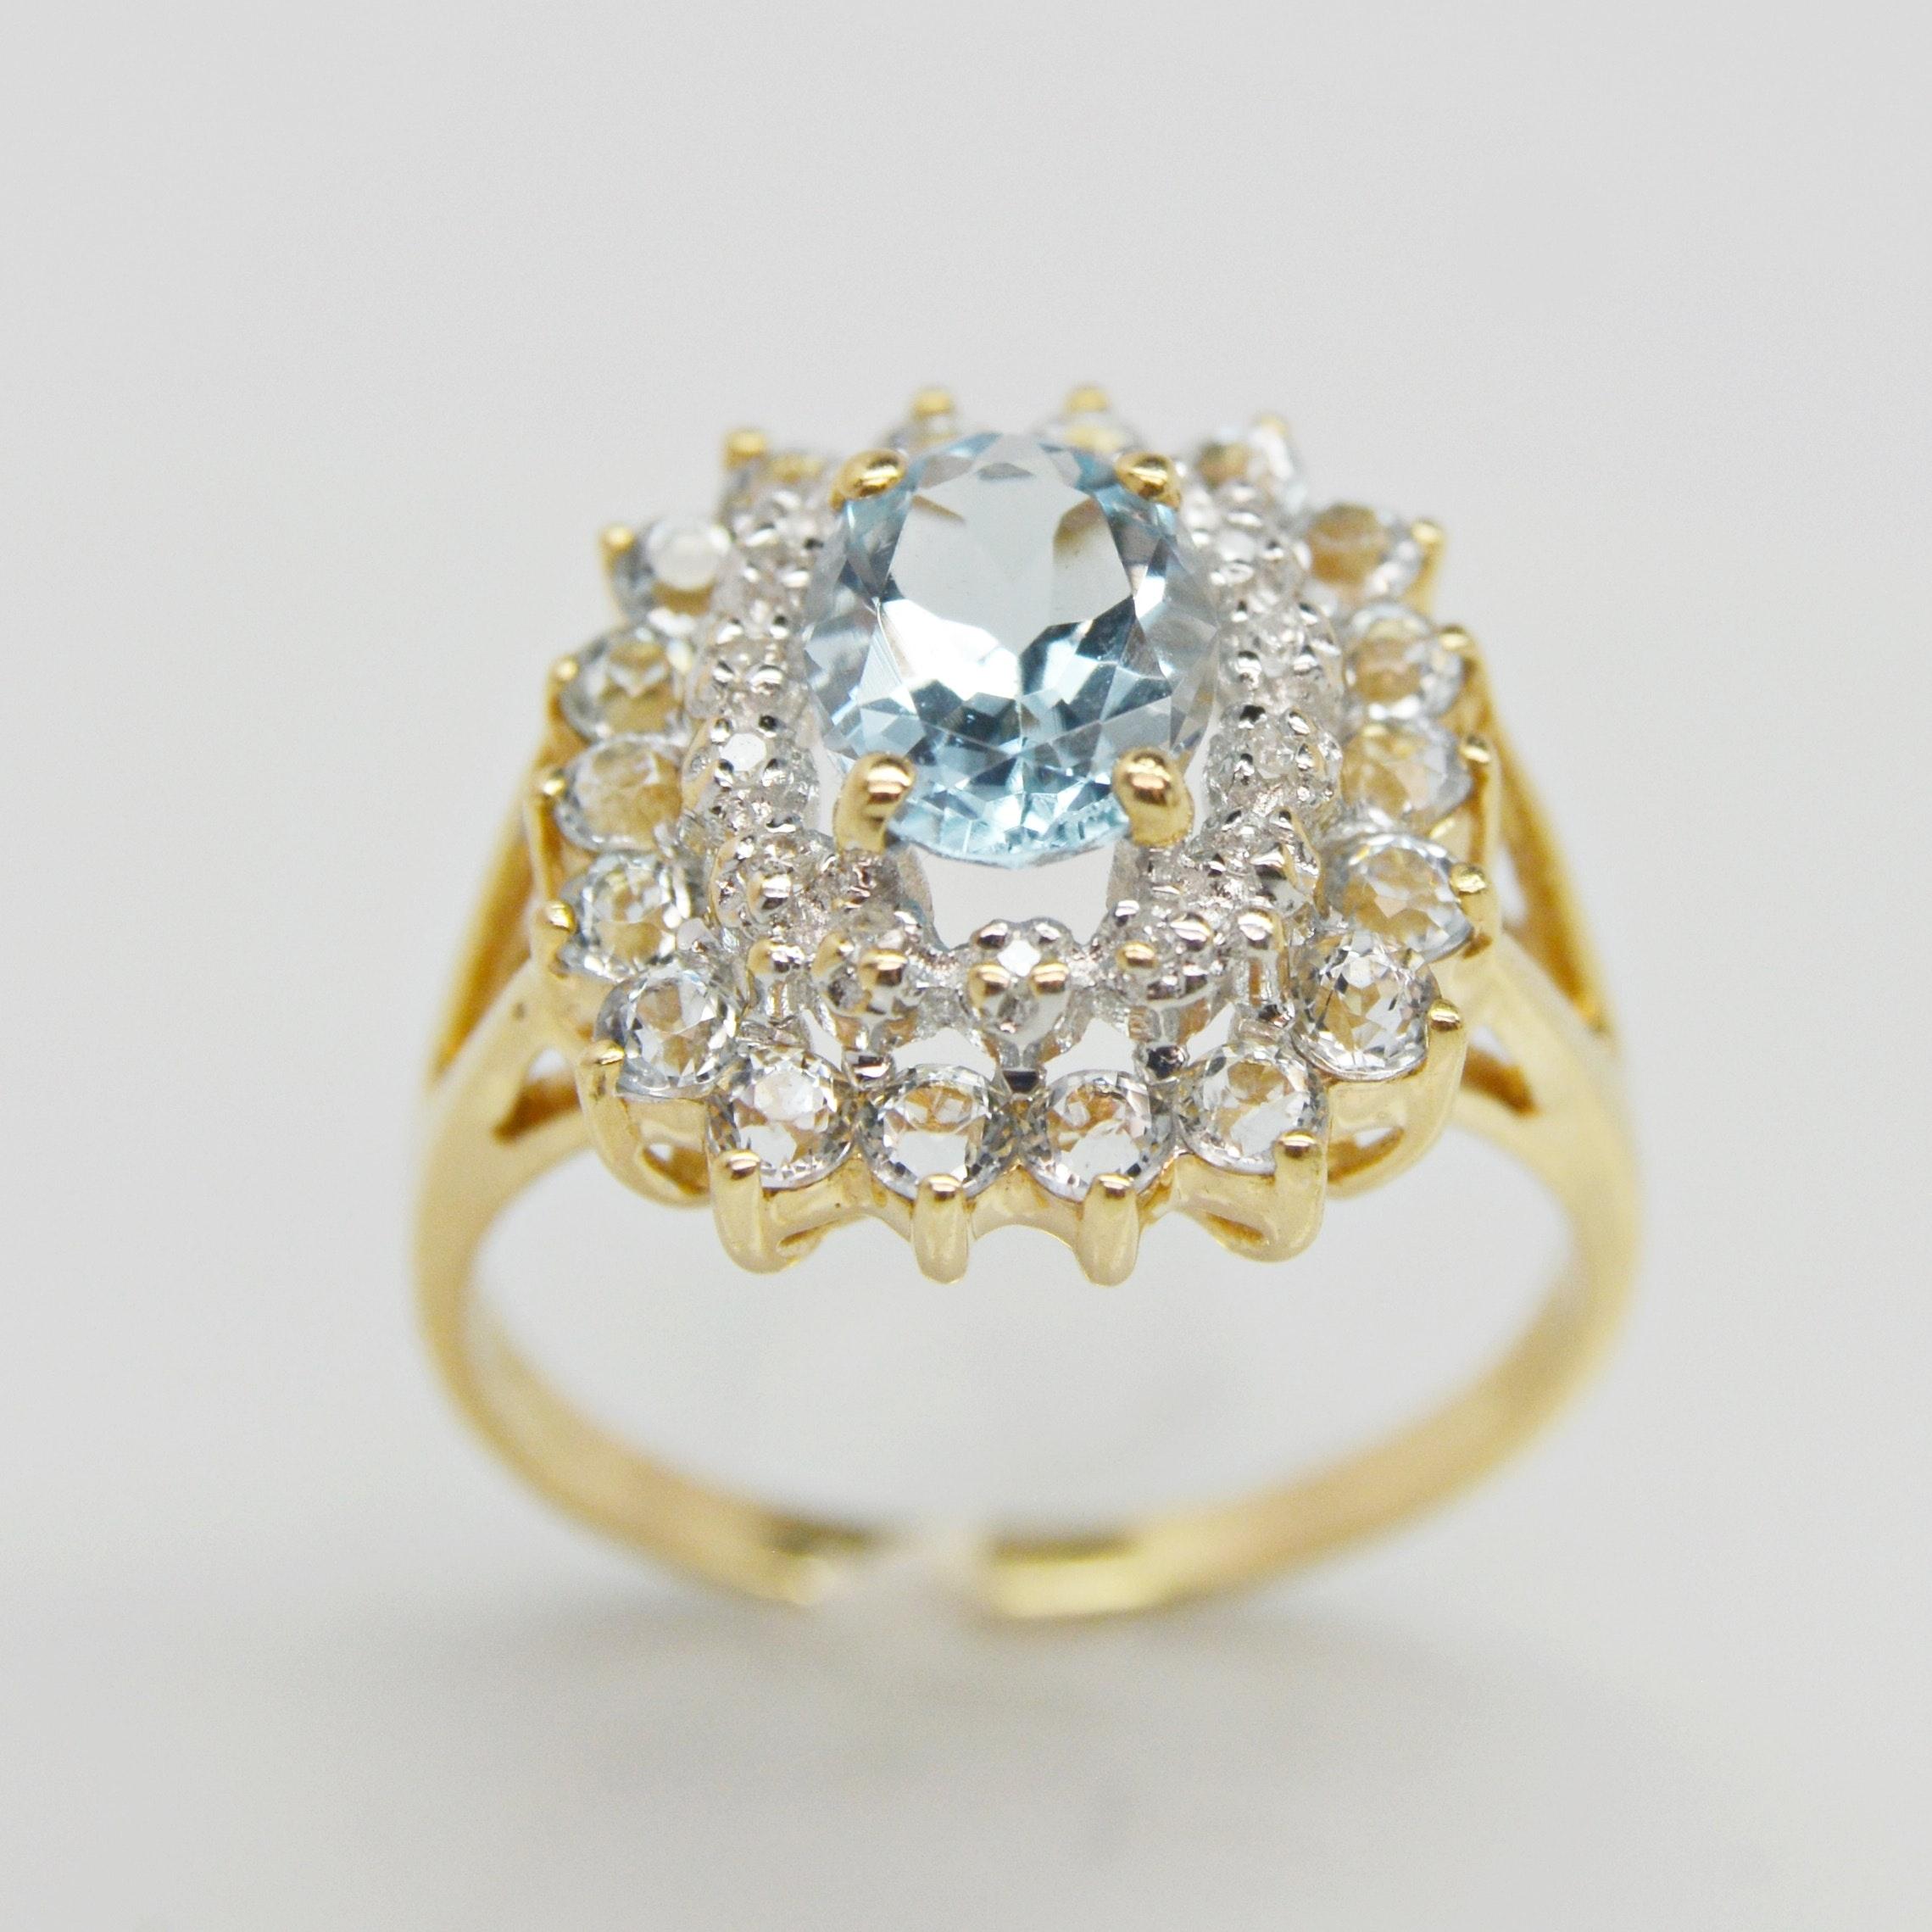 10K Yellow Gold Aquamarine and Diamond Halo Ring